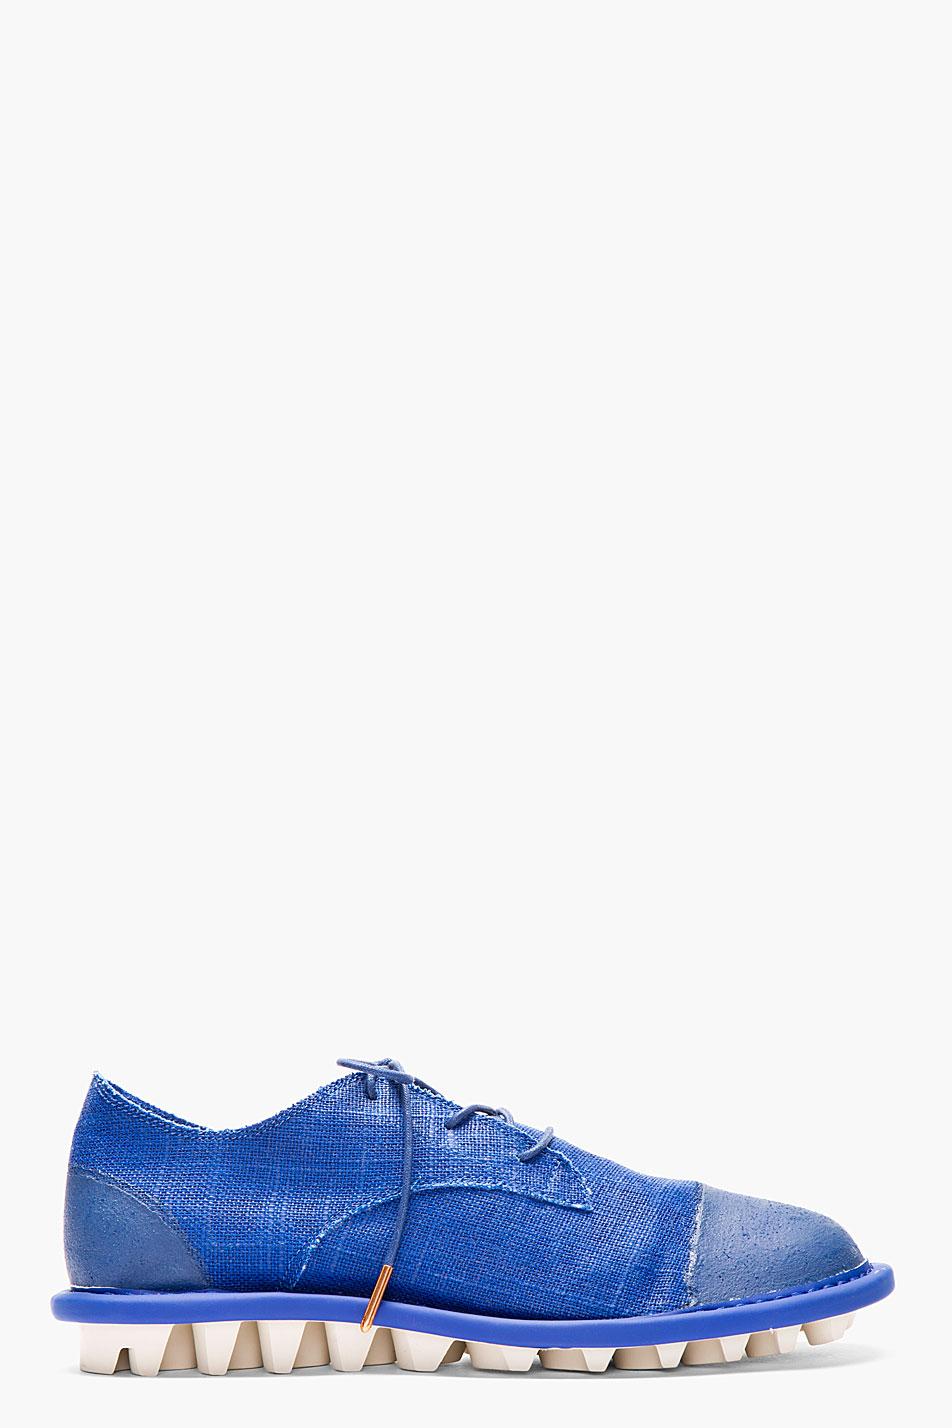 adidas by tom dixon royal blue canvas minimalist travelers